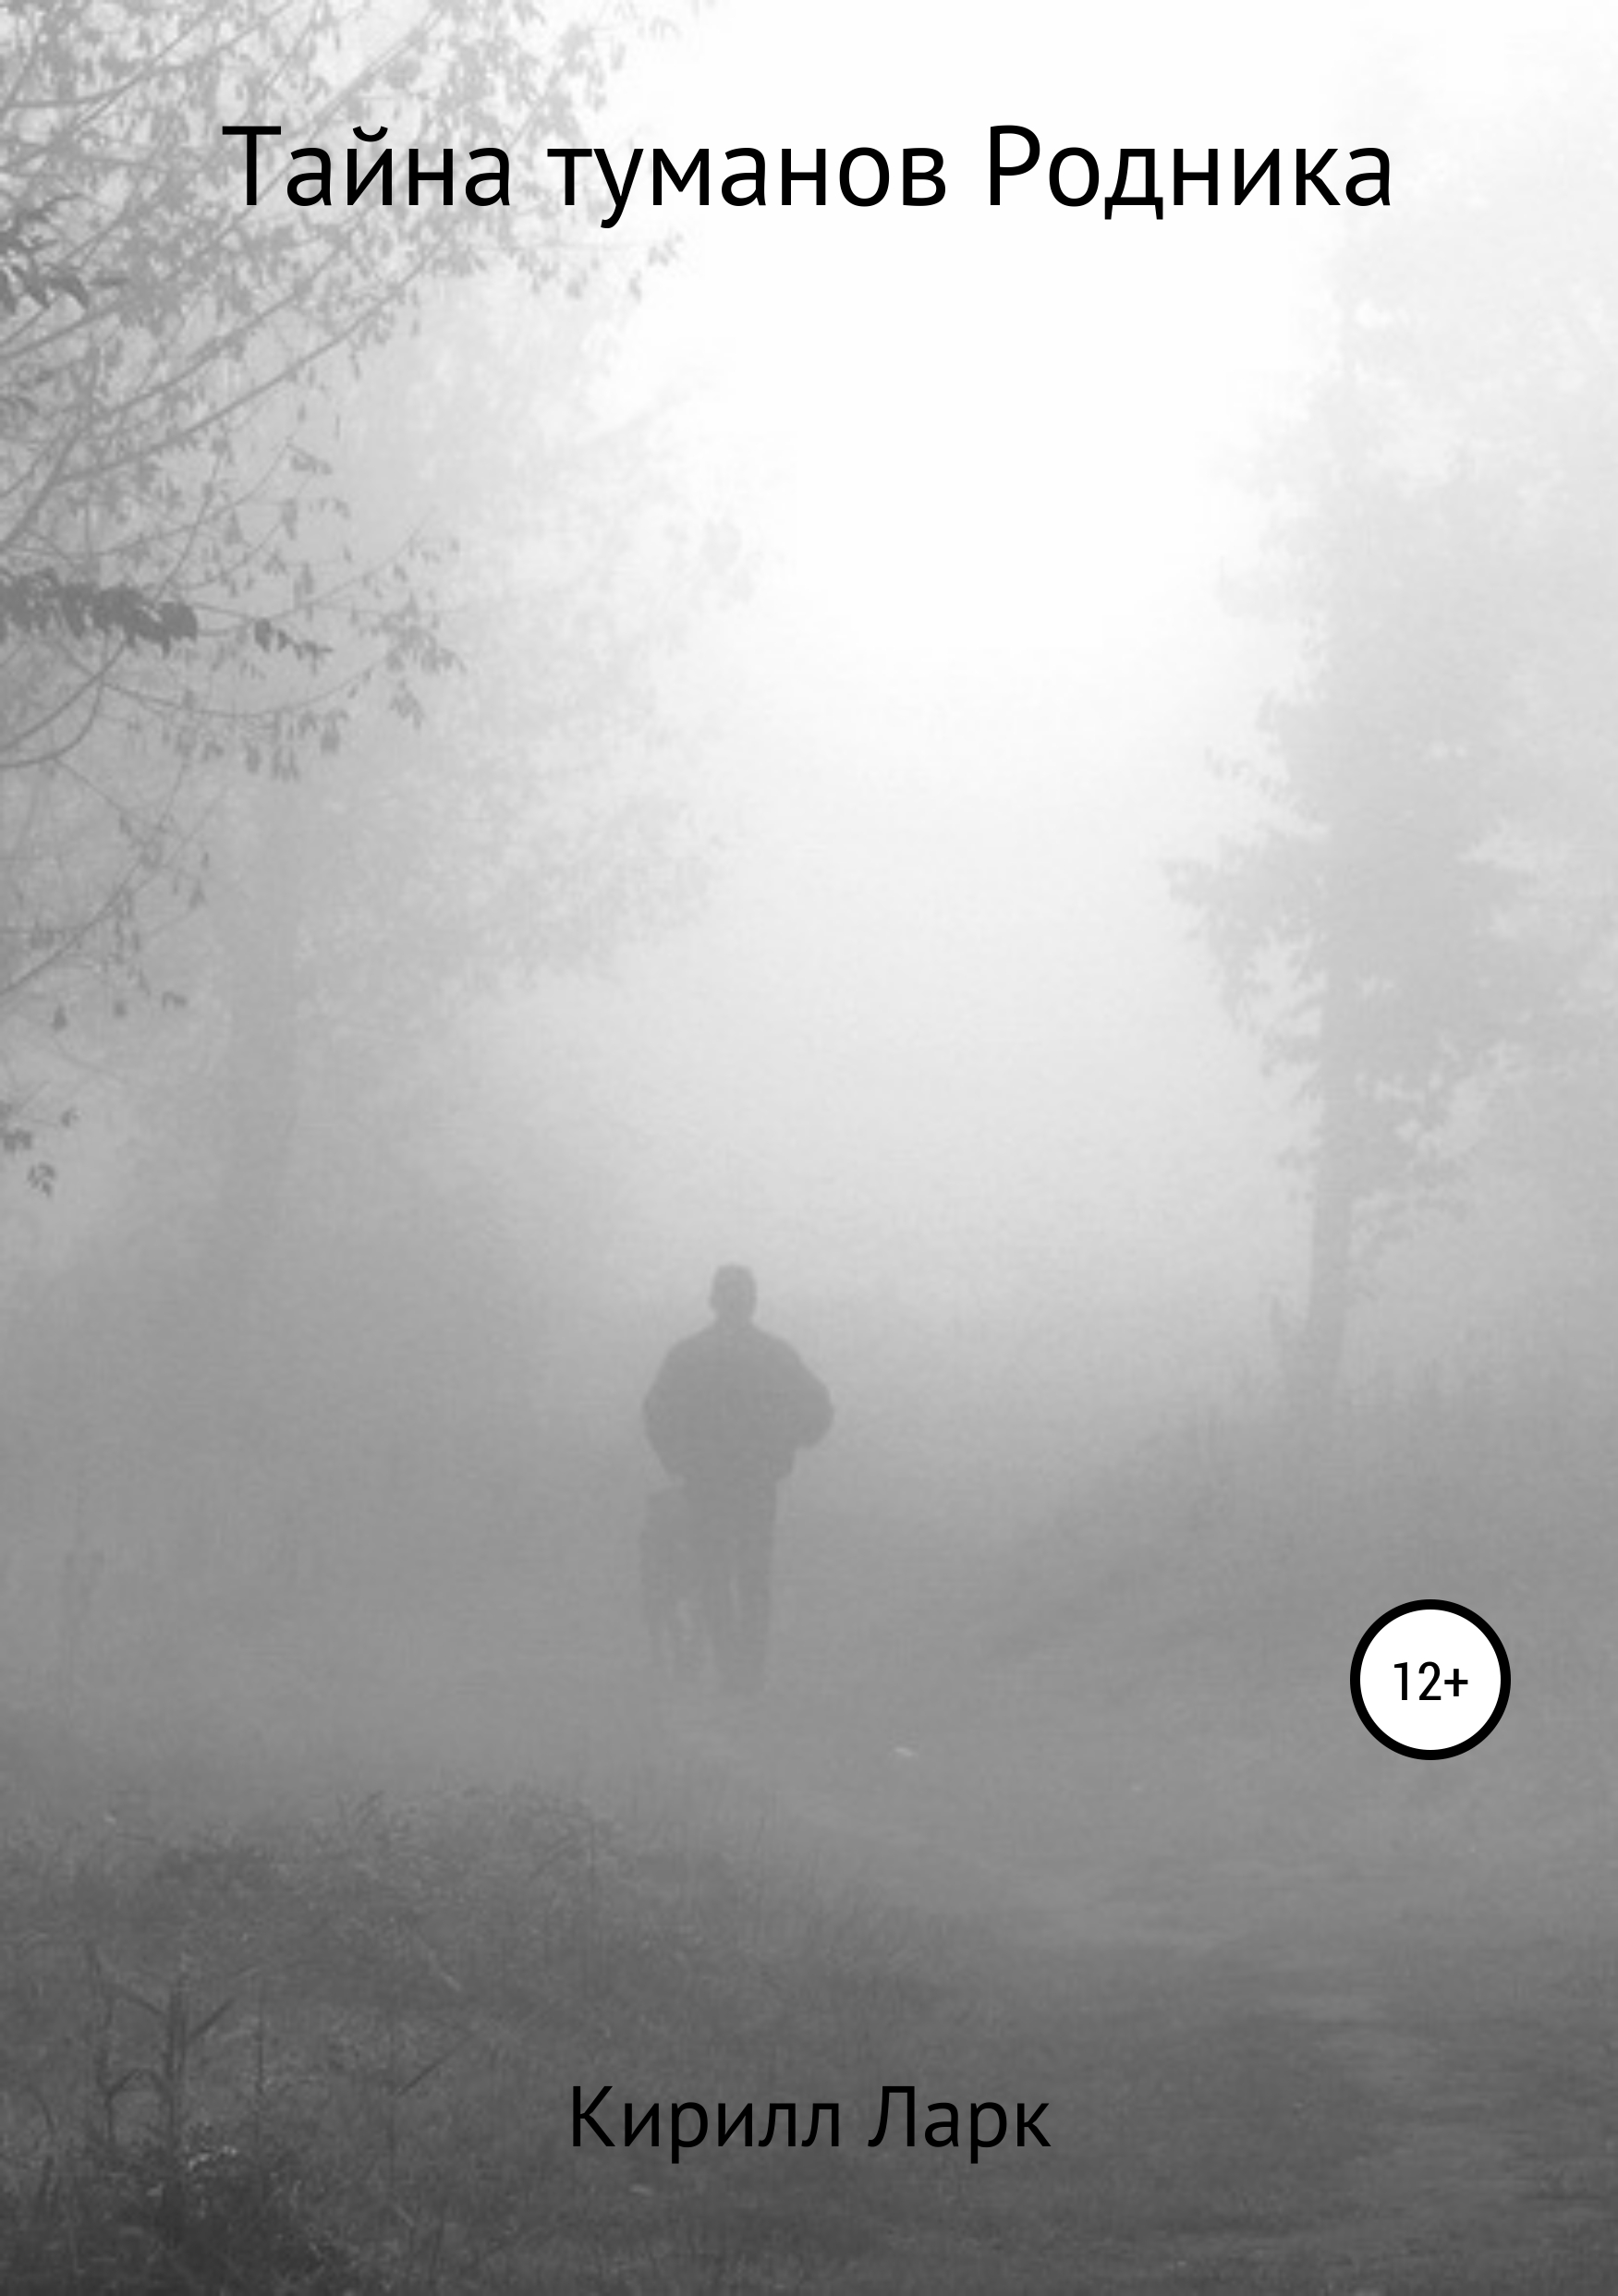 Кирилл Павлавич Ларк Тайна Туманов Родника татьяна белоусова ротштеин королевский туман